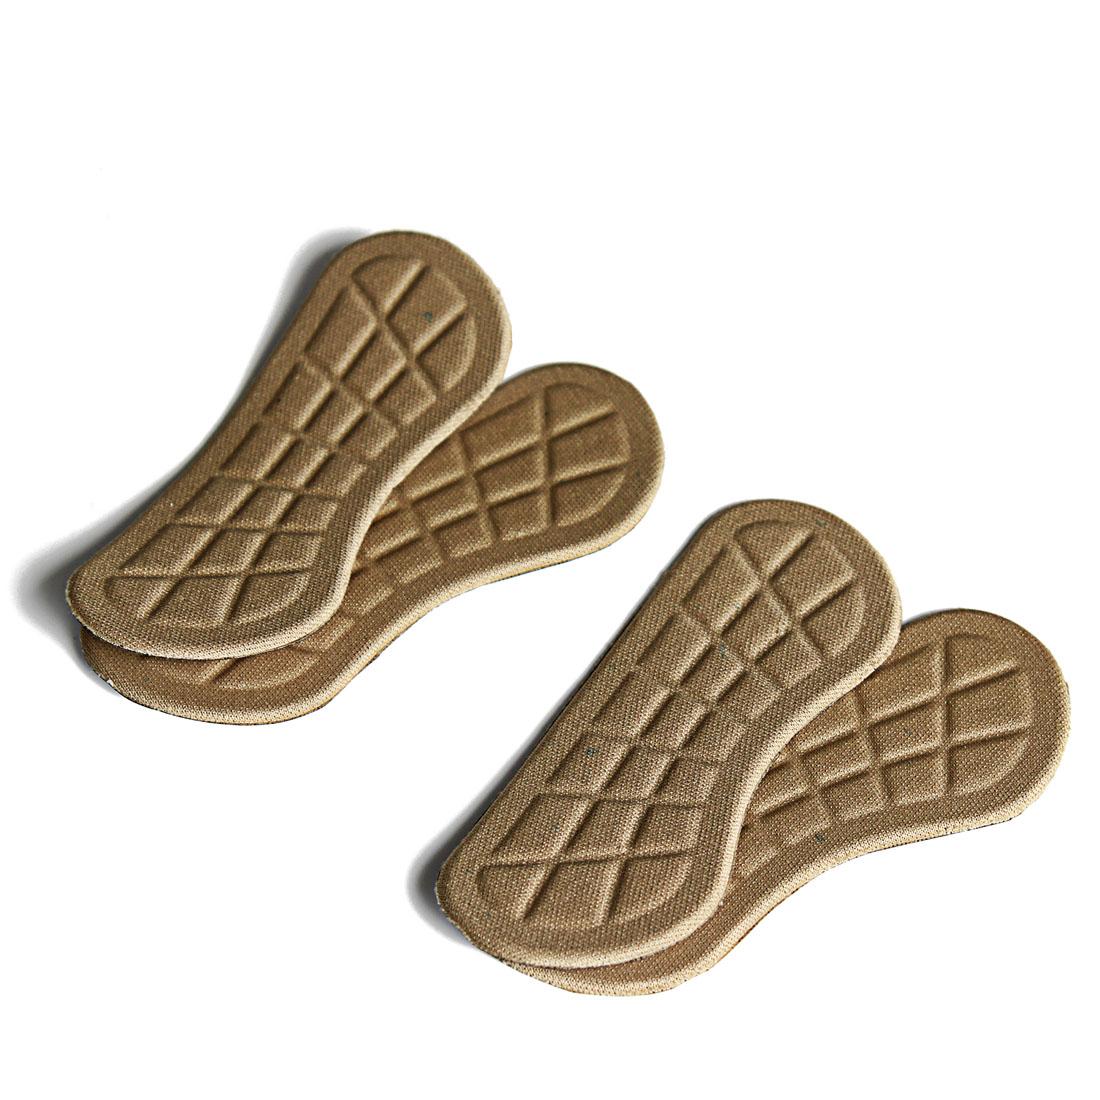 Накладки на пятку для обуви Vital Comfort, 4 пары